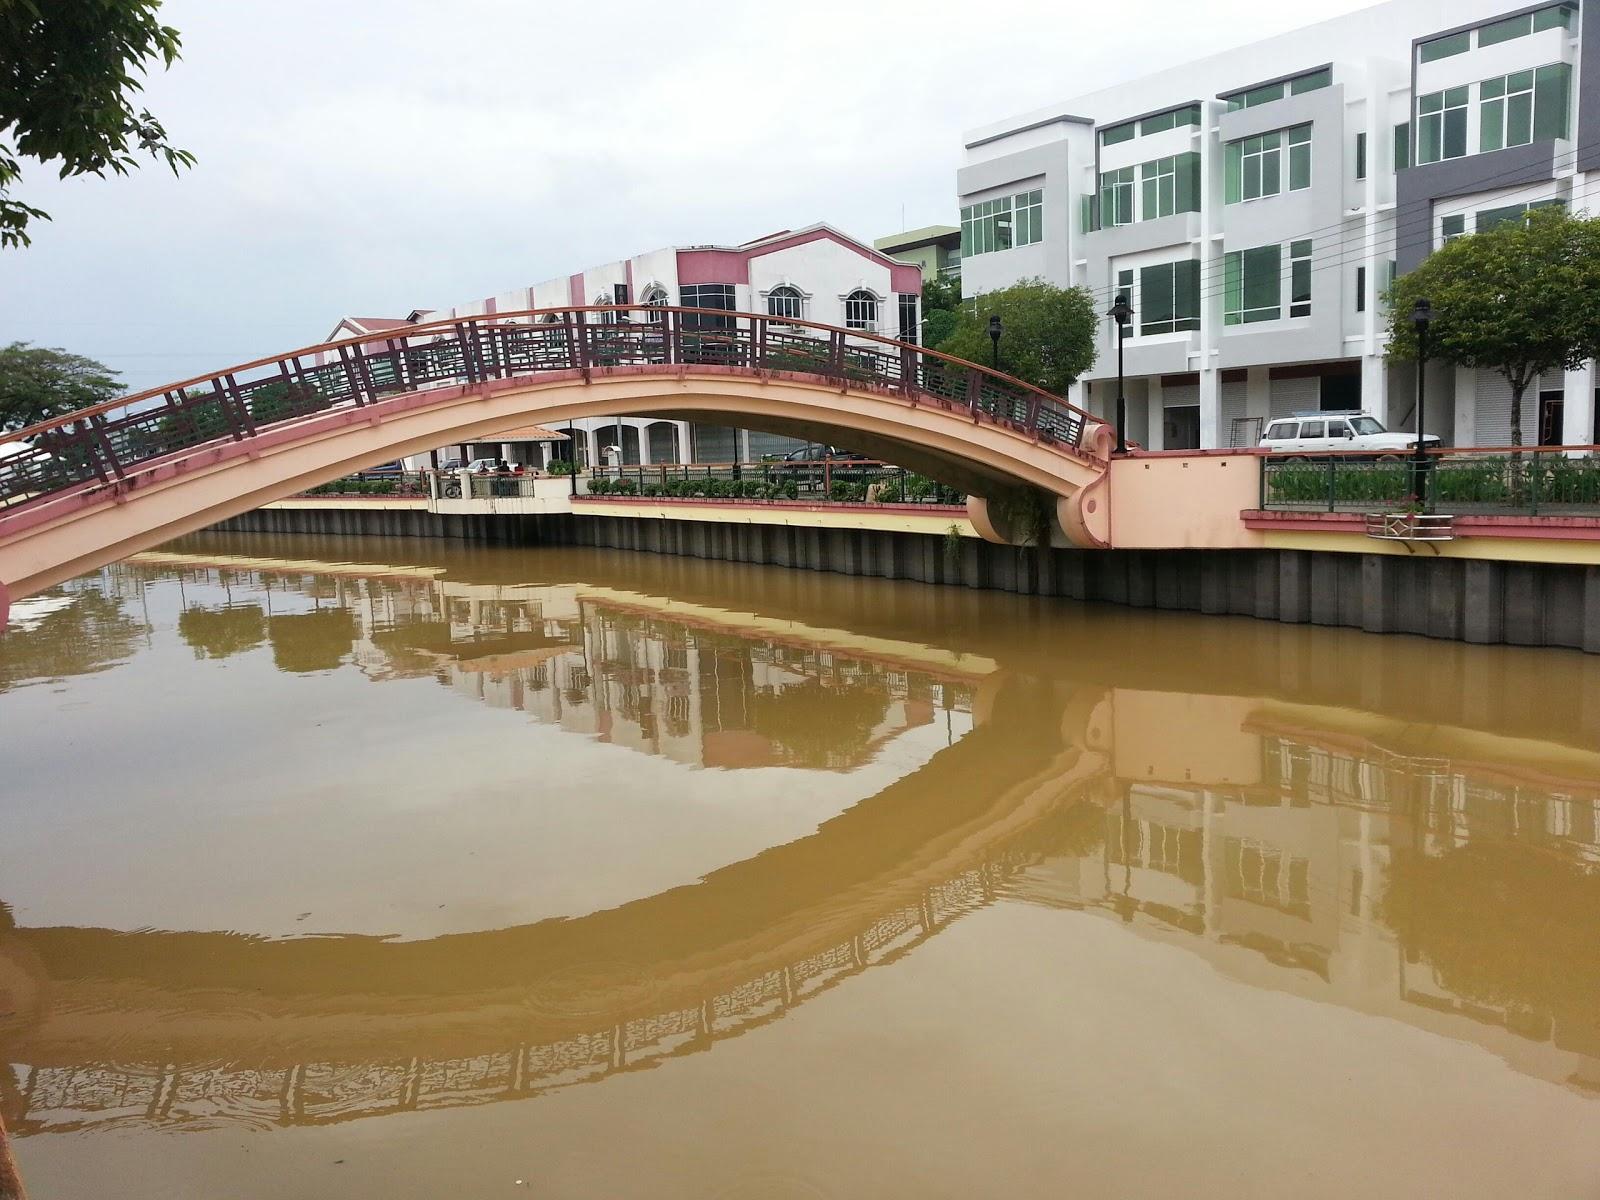 Discover Sibu, Sarawak: Wong Nai Siong Garden 黄乃裳公园